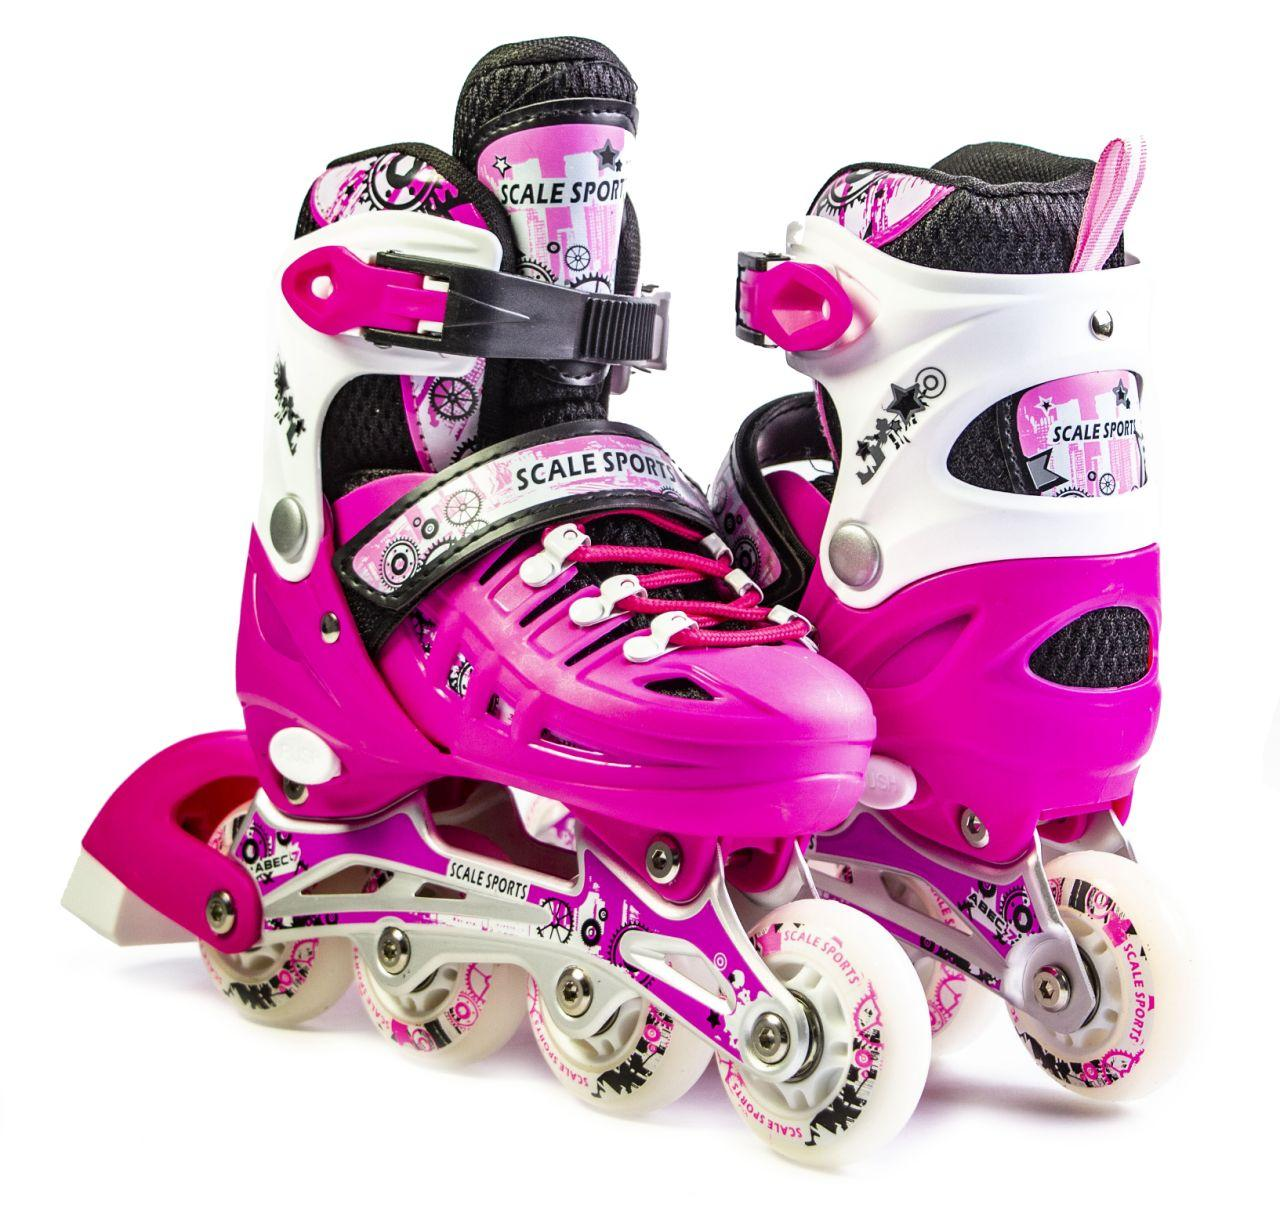 Ролики Scale Sports Pink LF 905, размер 38-42